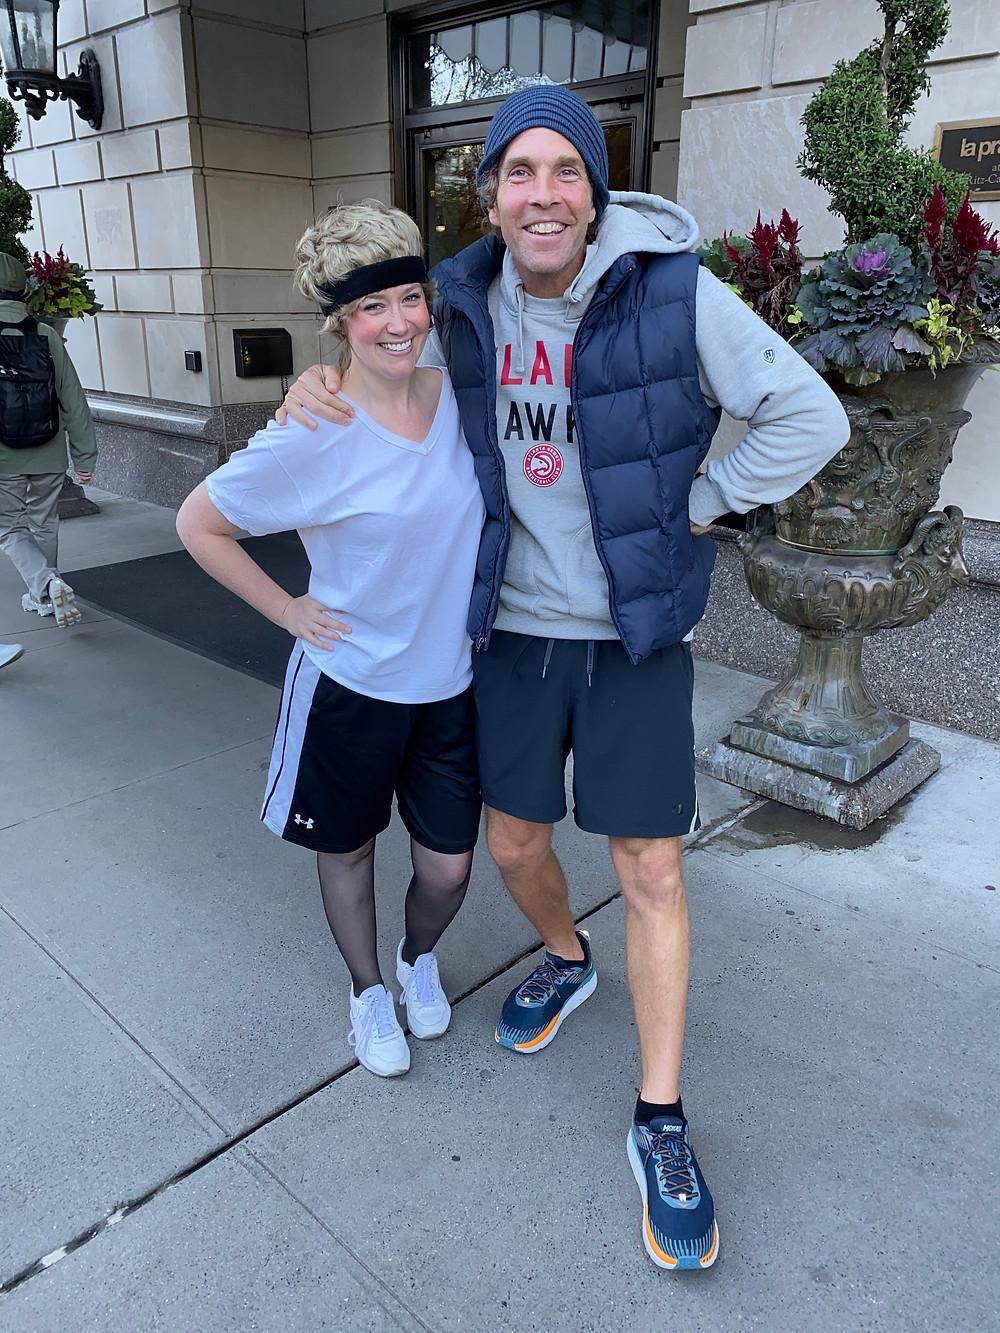 Jackie Collier posing with Jesse Itzler, ultramarathoner and entrepreneur!